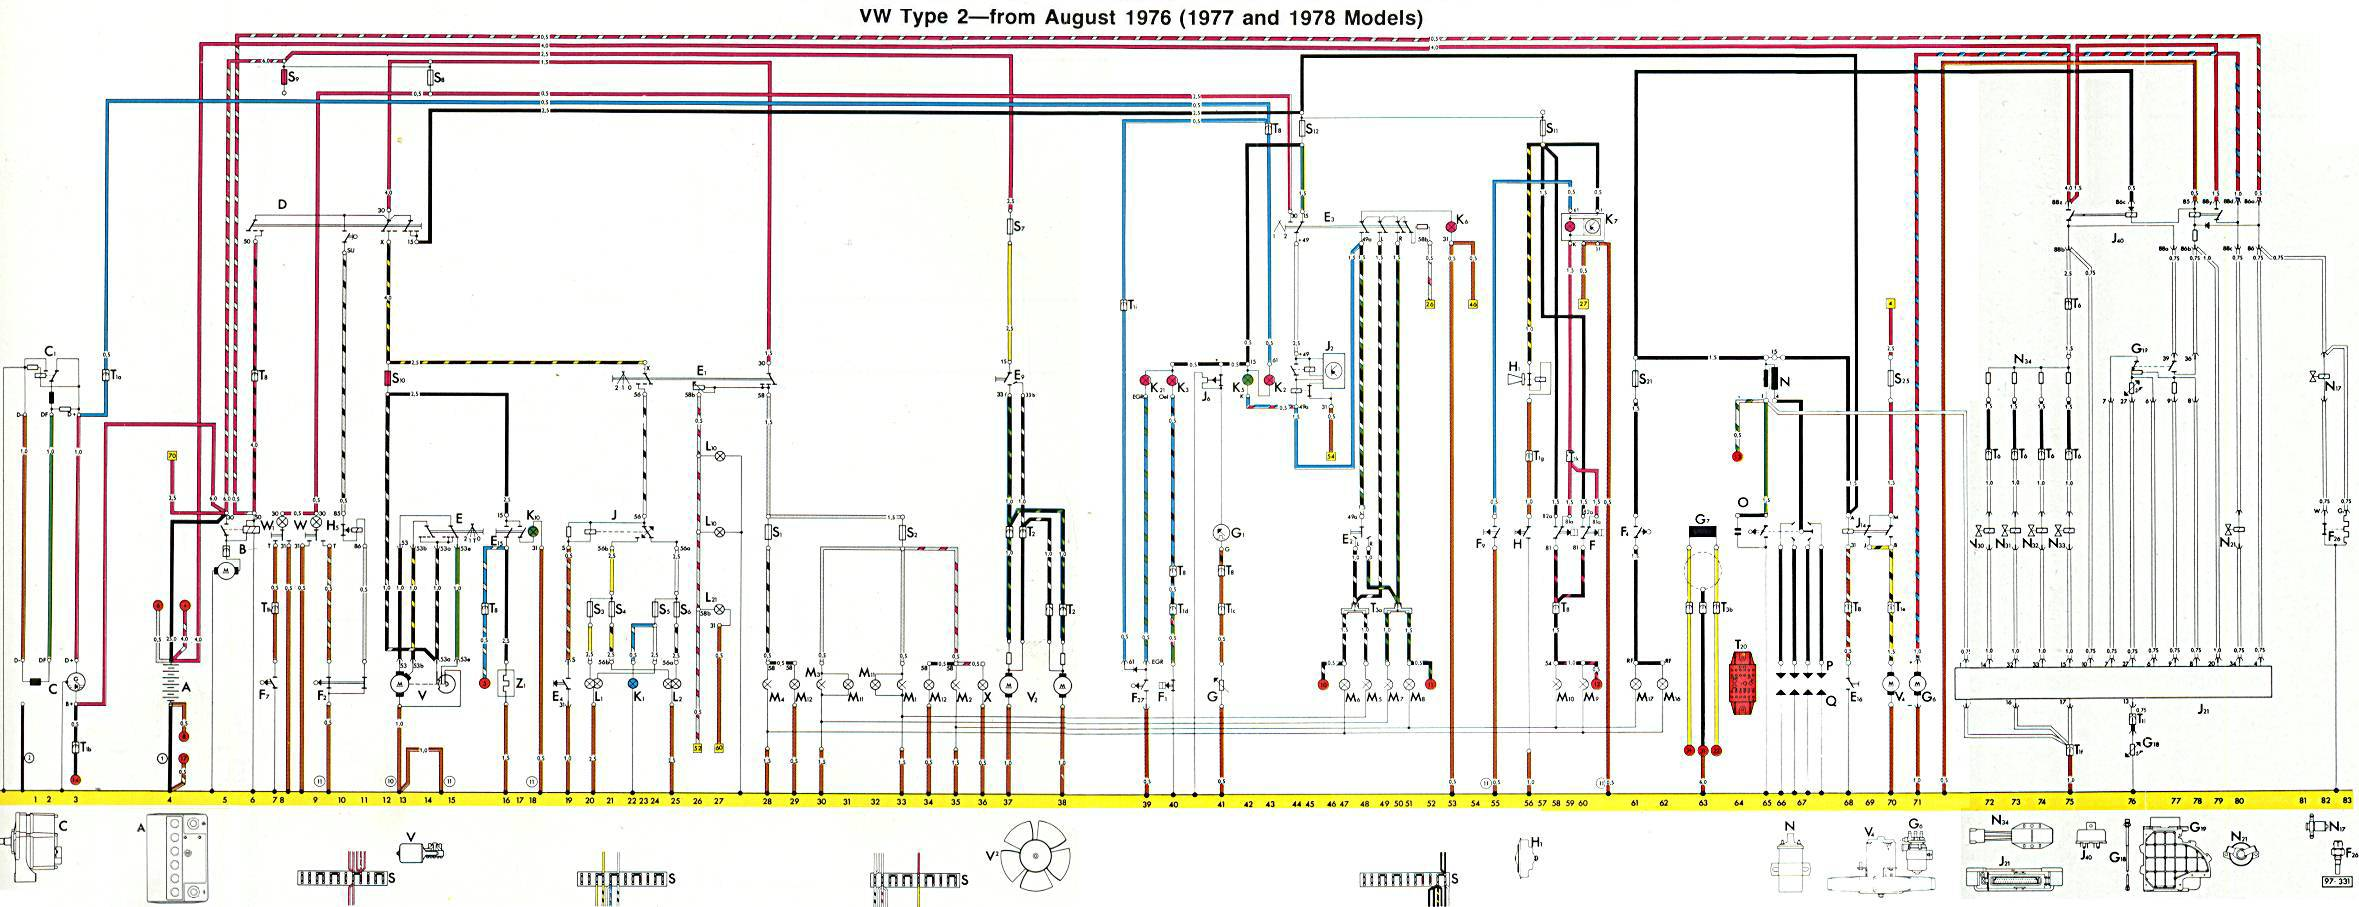 1978 vw bus wiring diagram ez go textron battery schematic manual e books fuse 78